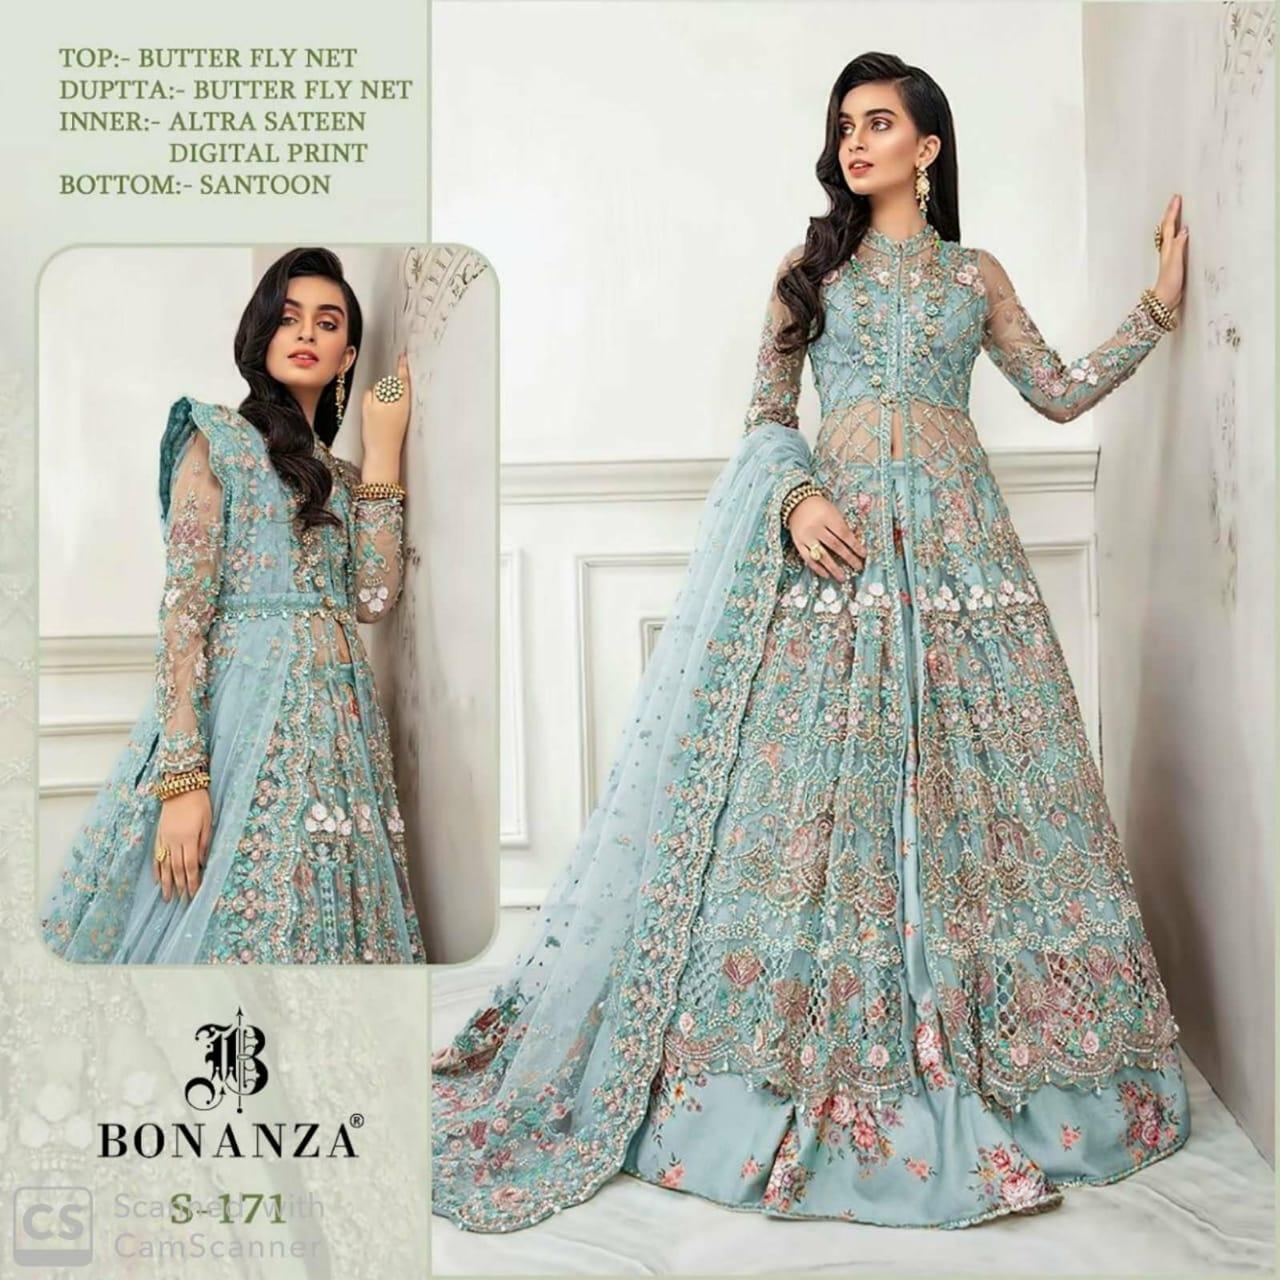 Bonanza S-171 Designer Net Suit